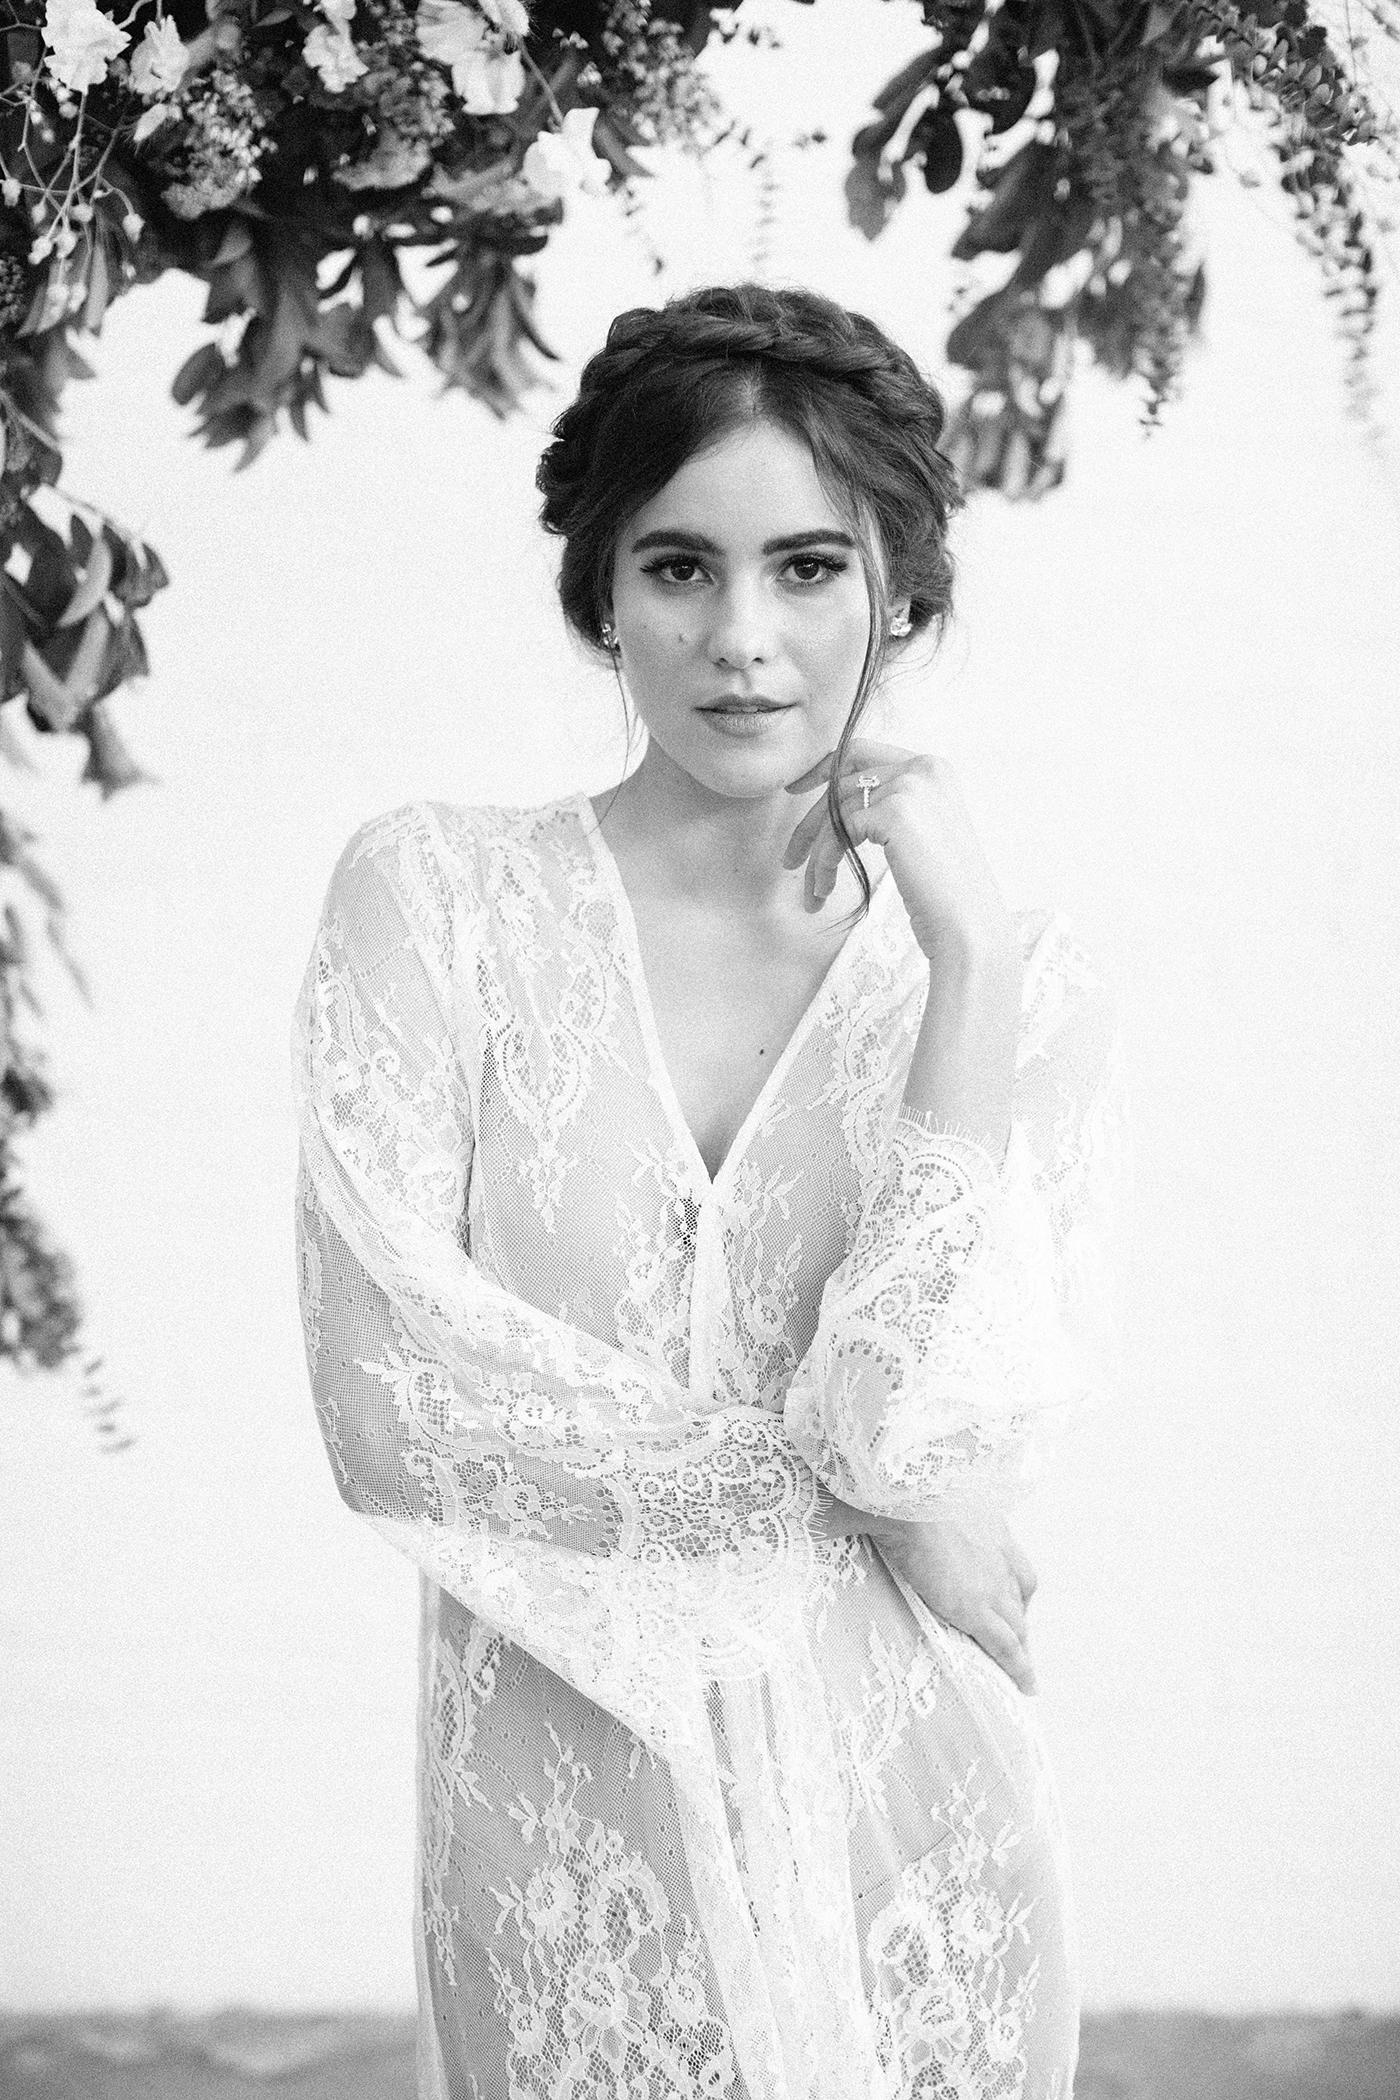 Wedding Floral Design Dallas - Olive Grove Design - Mimimalist Fall Wedding - 00108.jpg